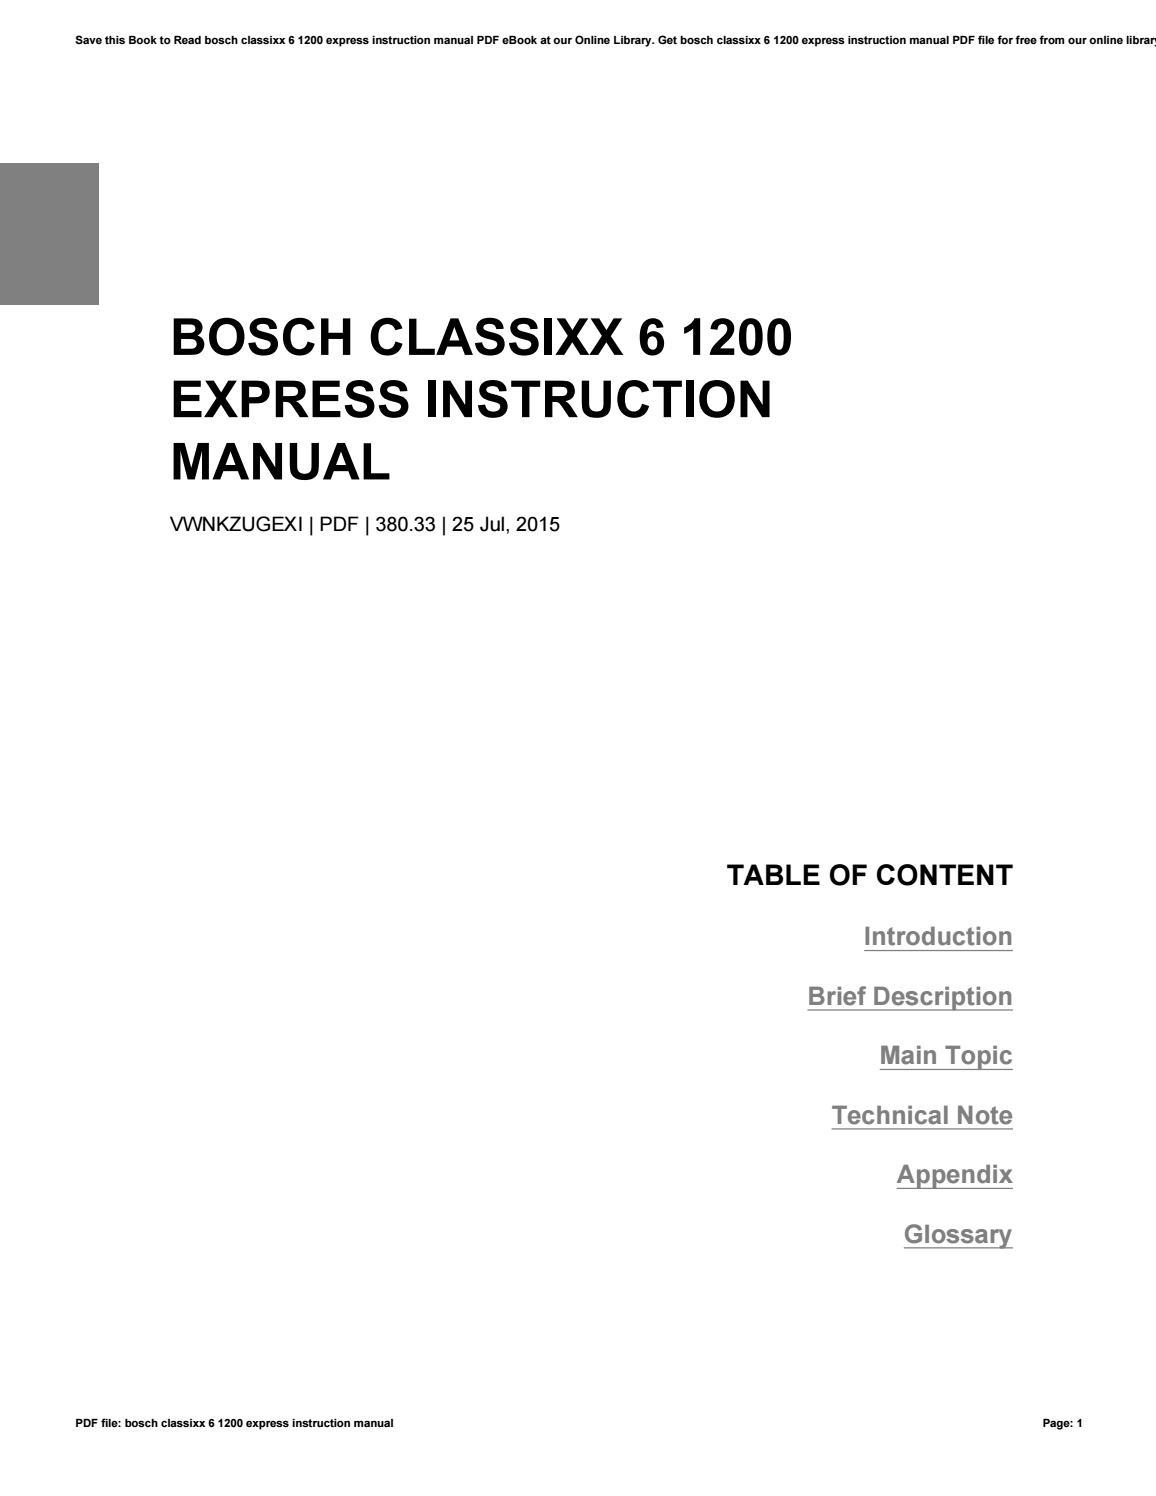 Bosch Classixx 6 1200 Express Instruction Manual By 69postix430 Issuu